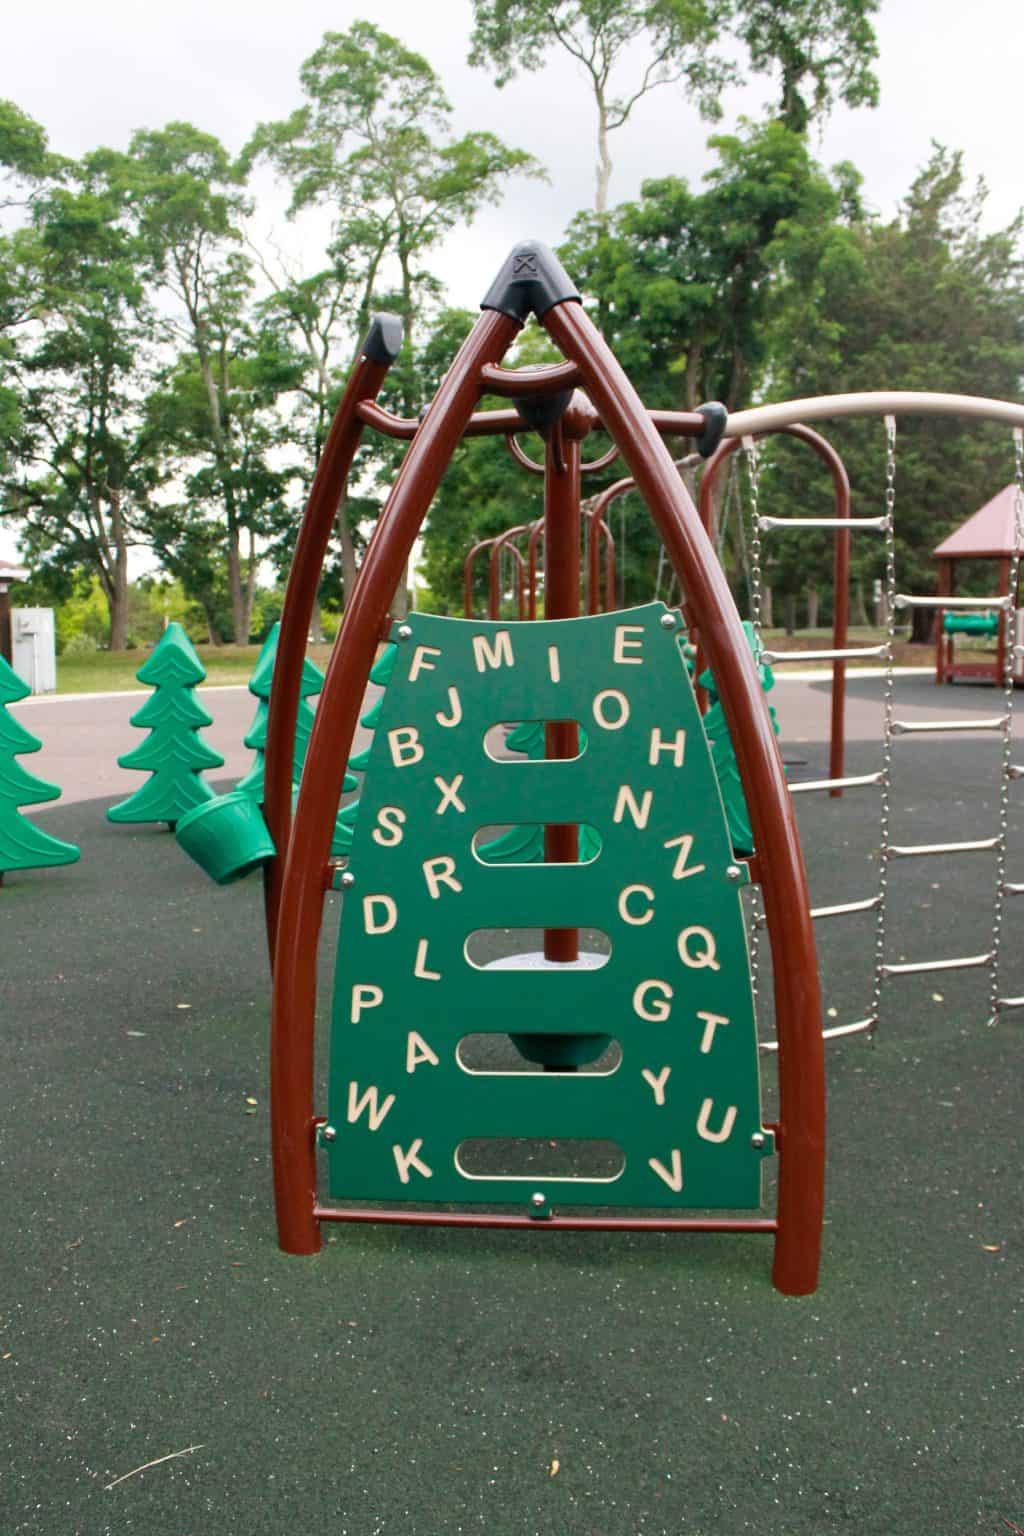 windward-beach-park-playground-brick-nj_27651422403_o-1024x1536